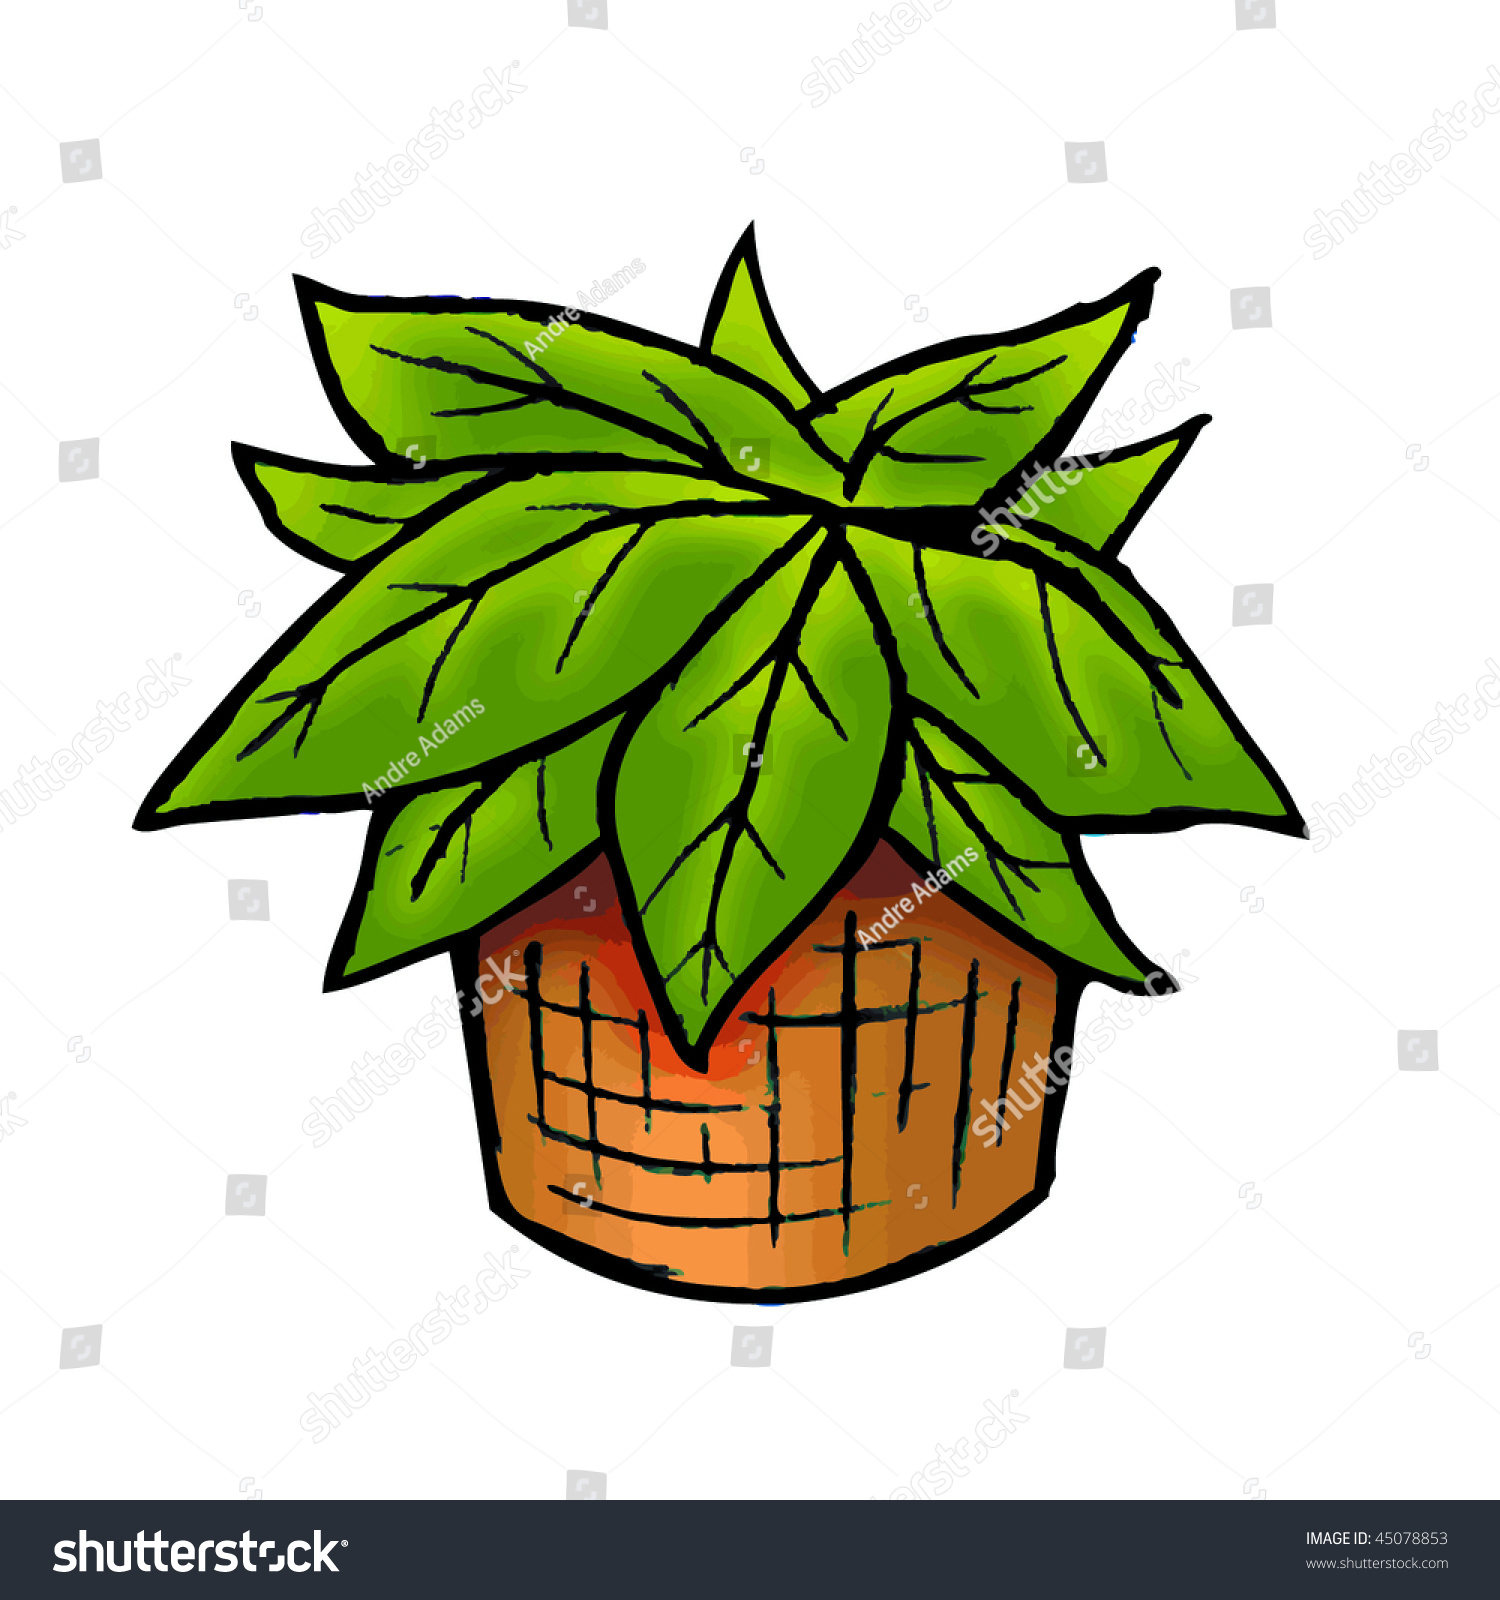 Cartoon Vector Illustration Potted Plant